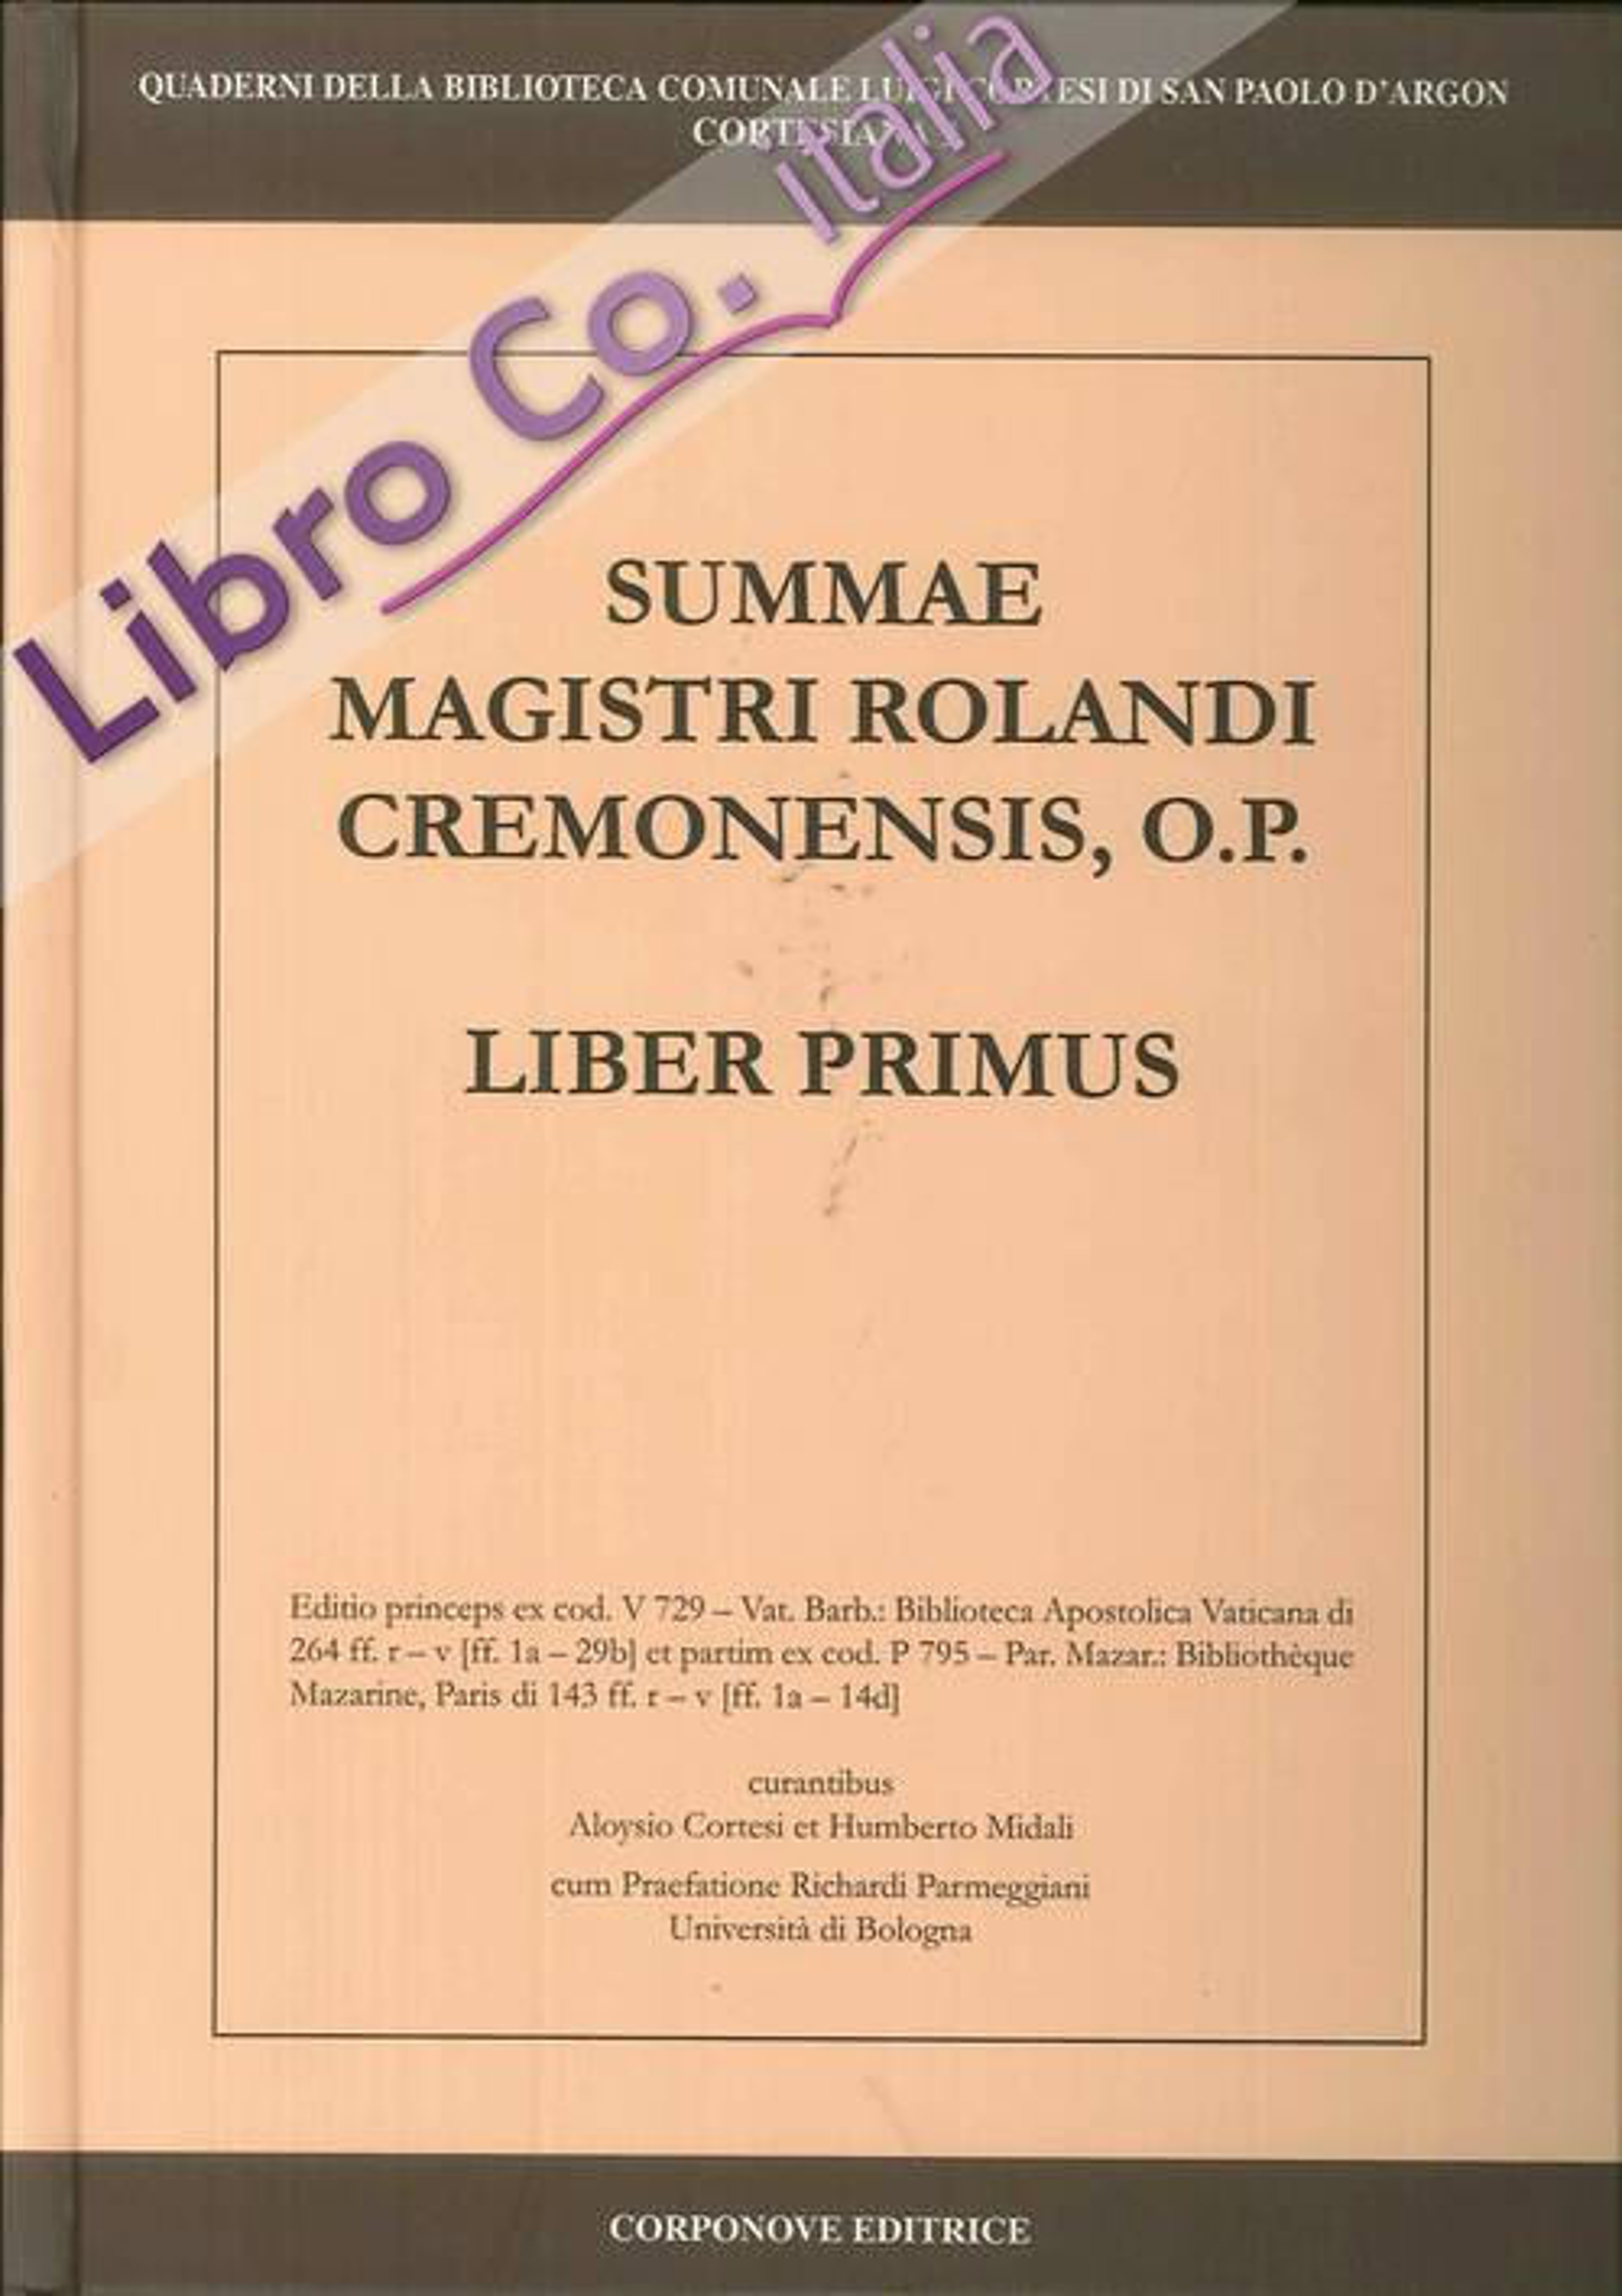 Summa Magistri Rolandi Cremonensis, O.p. Liber Primus.